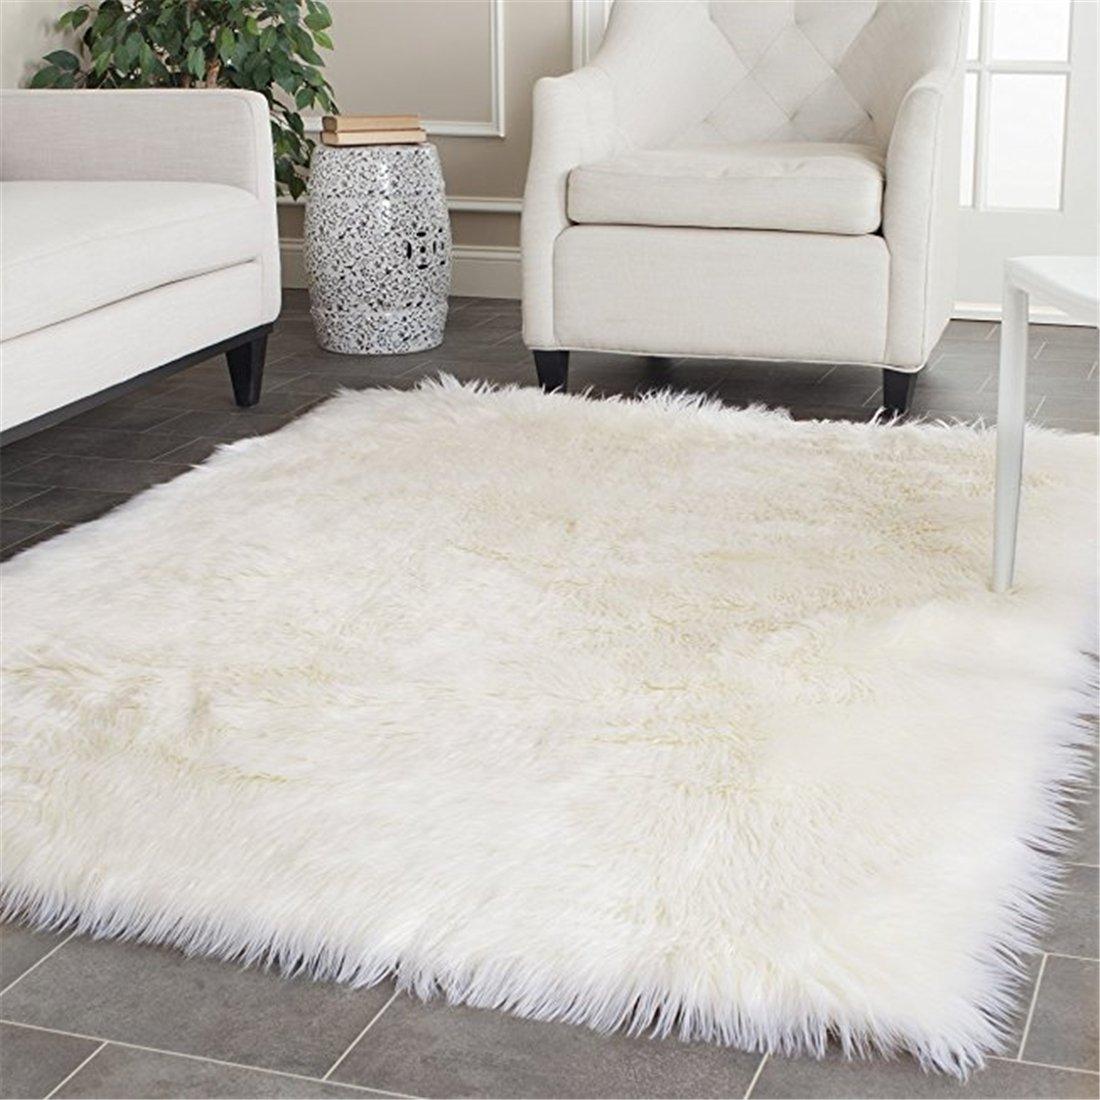 Meng Ge Faux Silky Deluxe Sheepskin Round Area Shag Rug Children Play Carpet for Living Bedroom 4x6ft,White